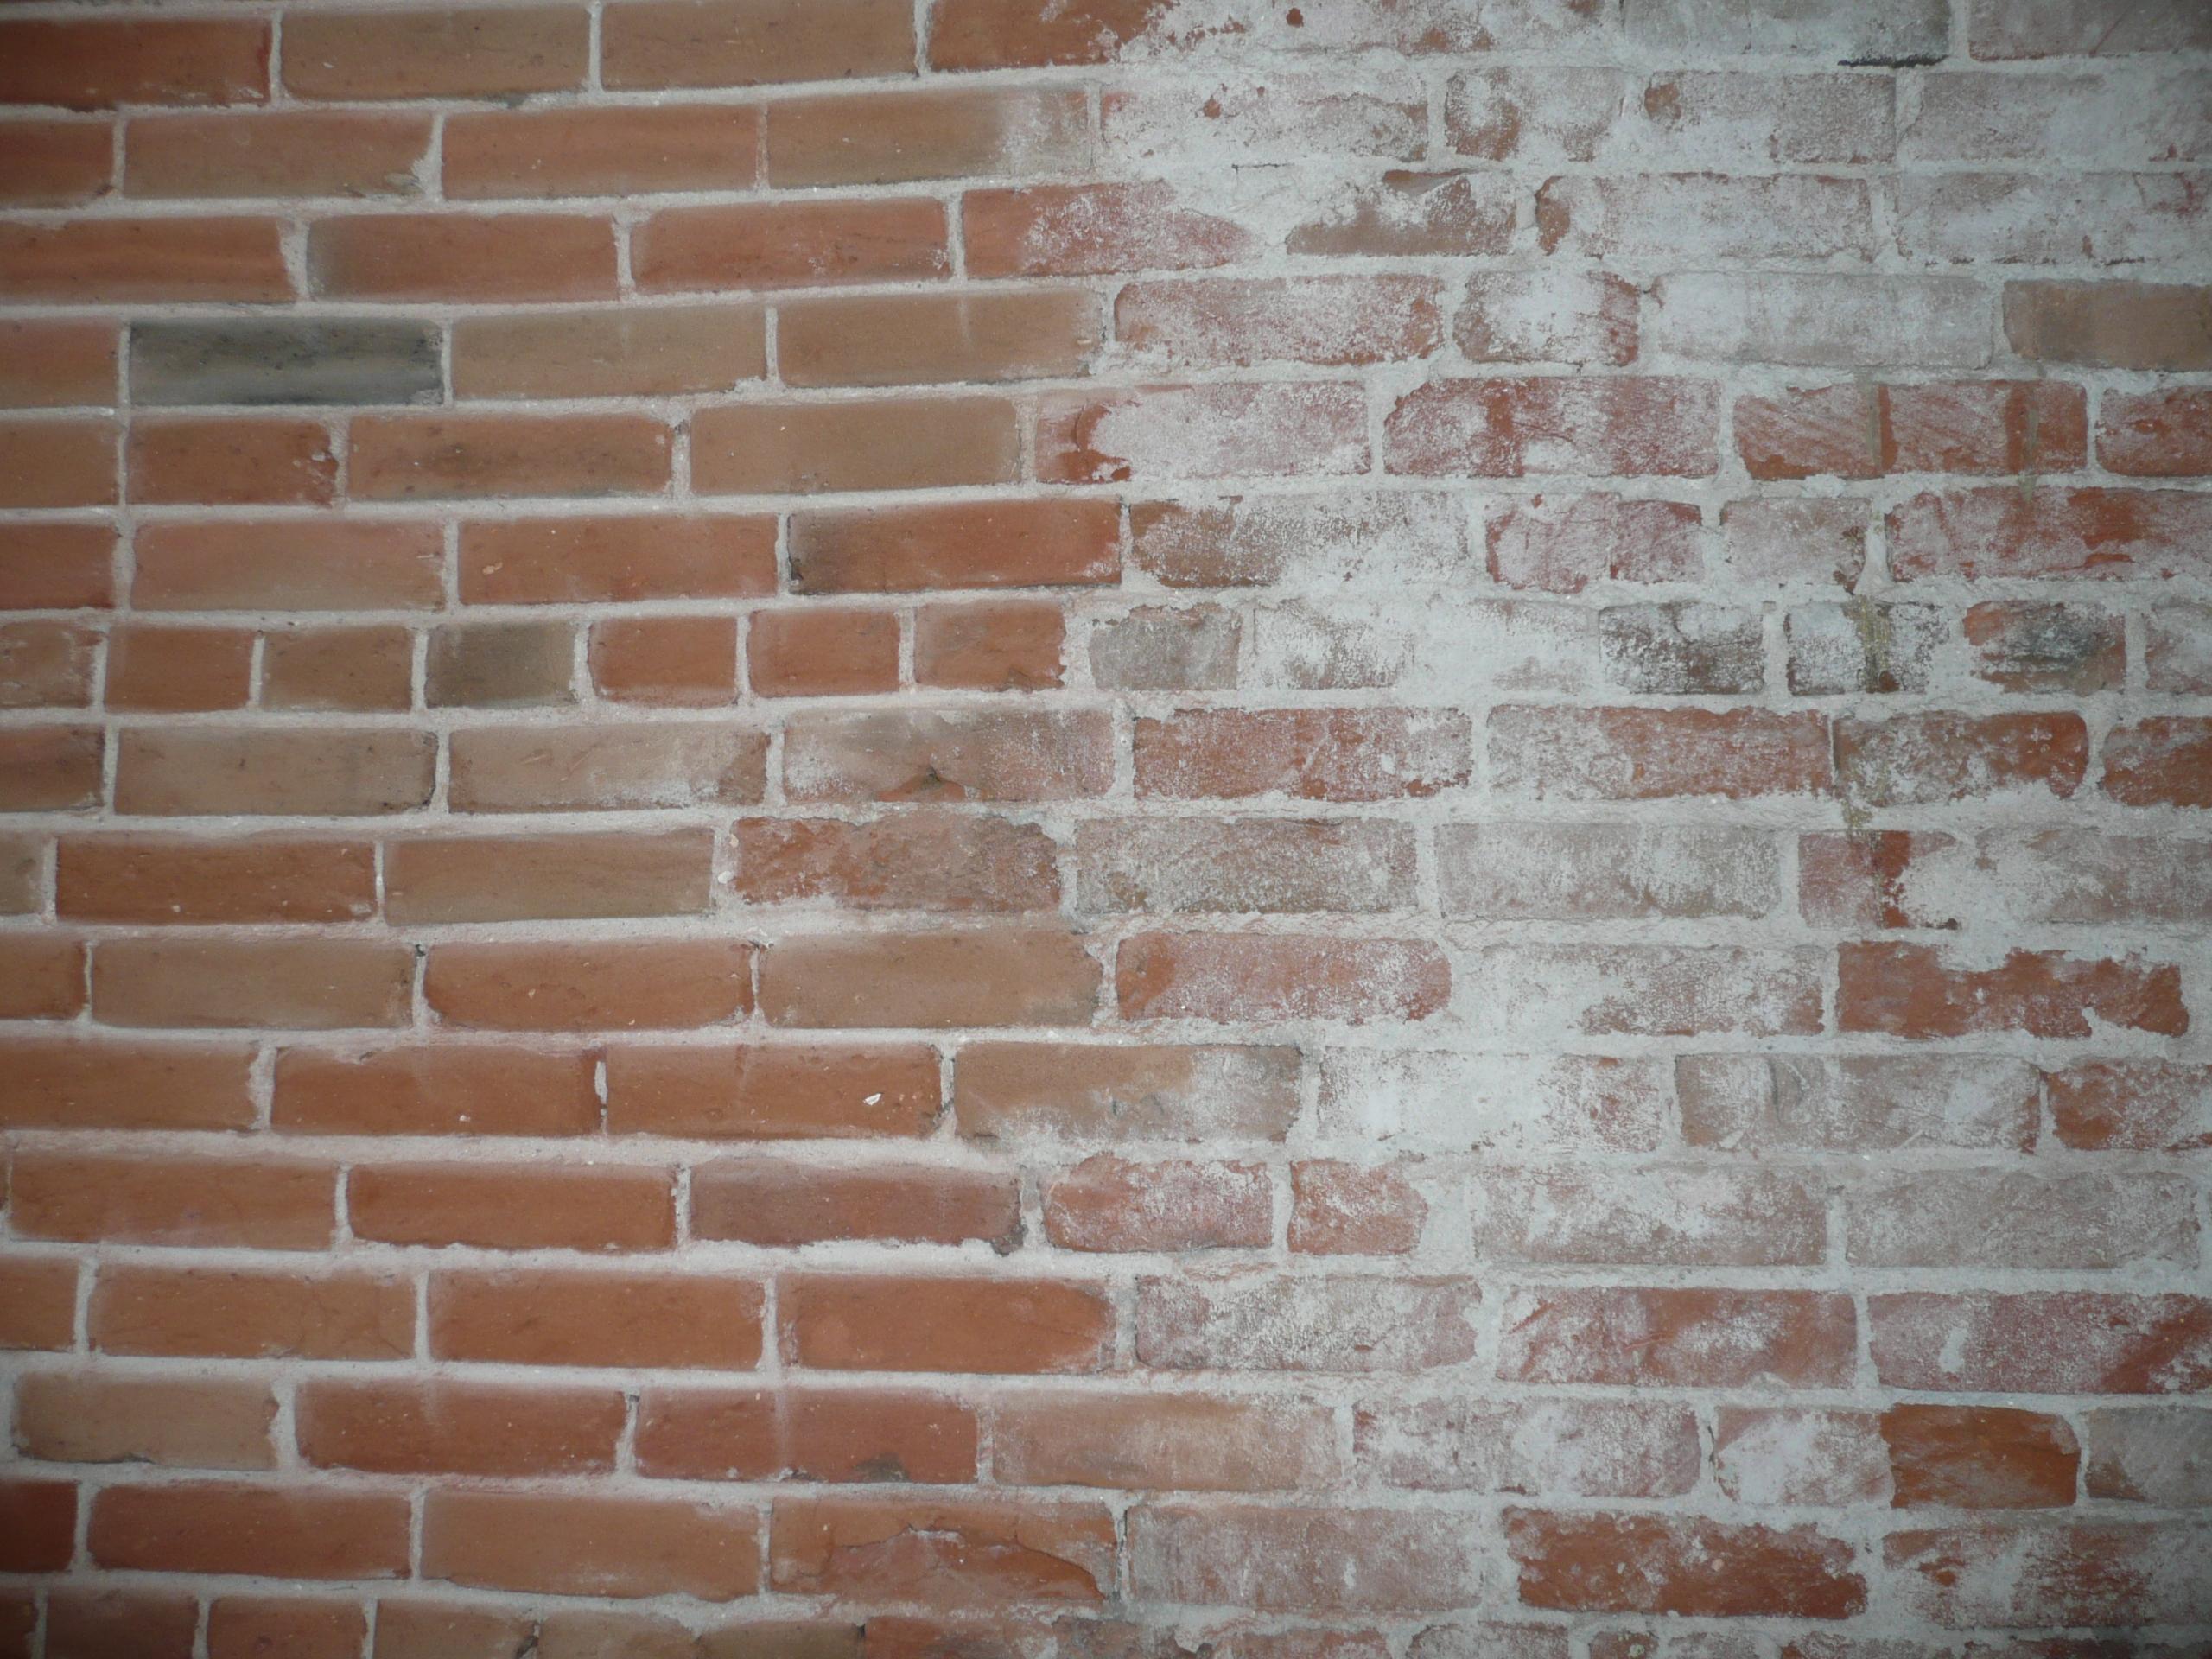 [48+] Textured Brick Wallpaper Home Depot on WallpaperSafari